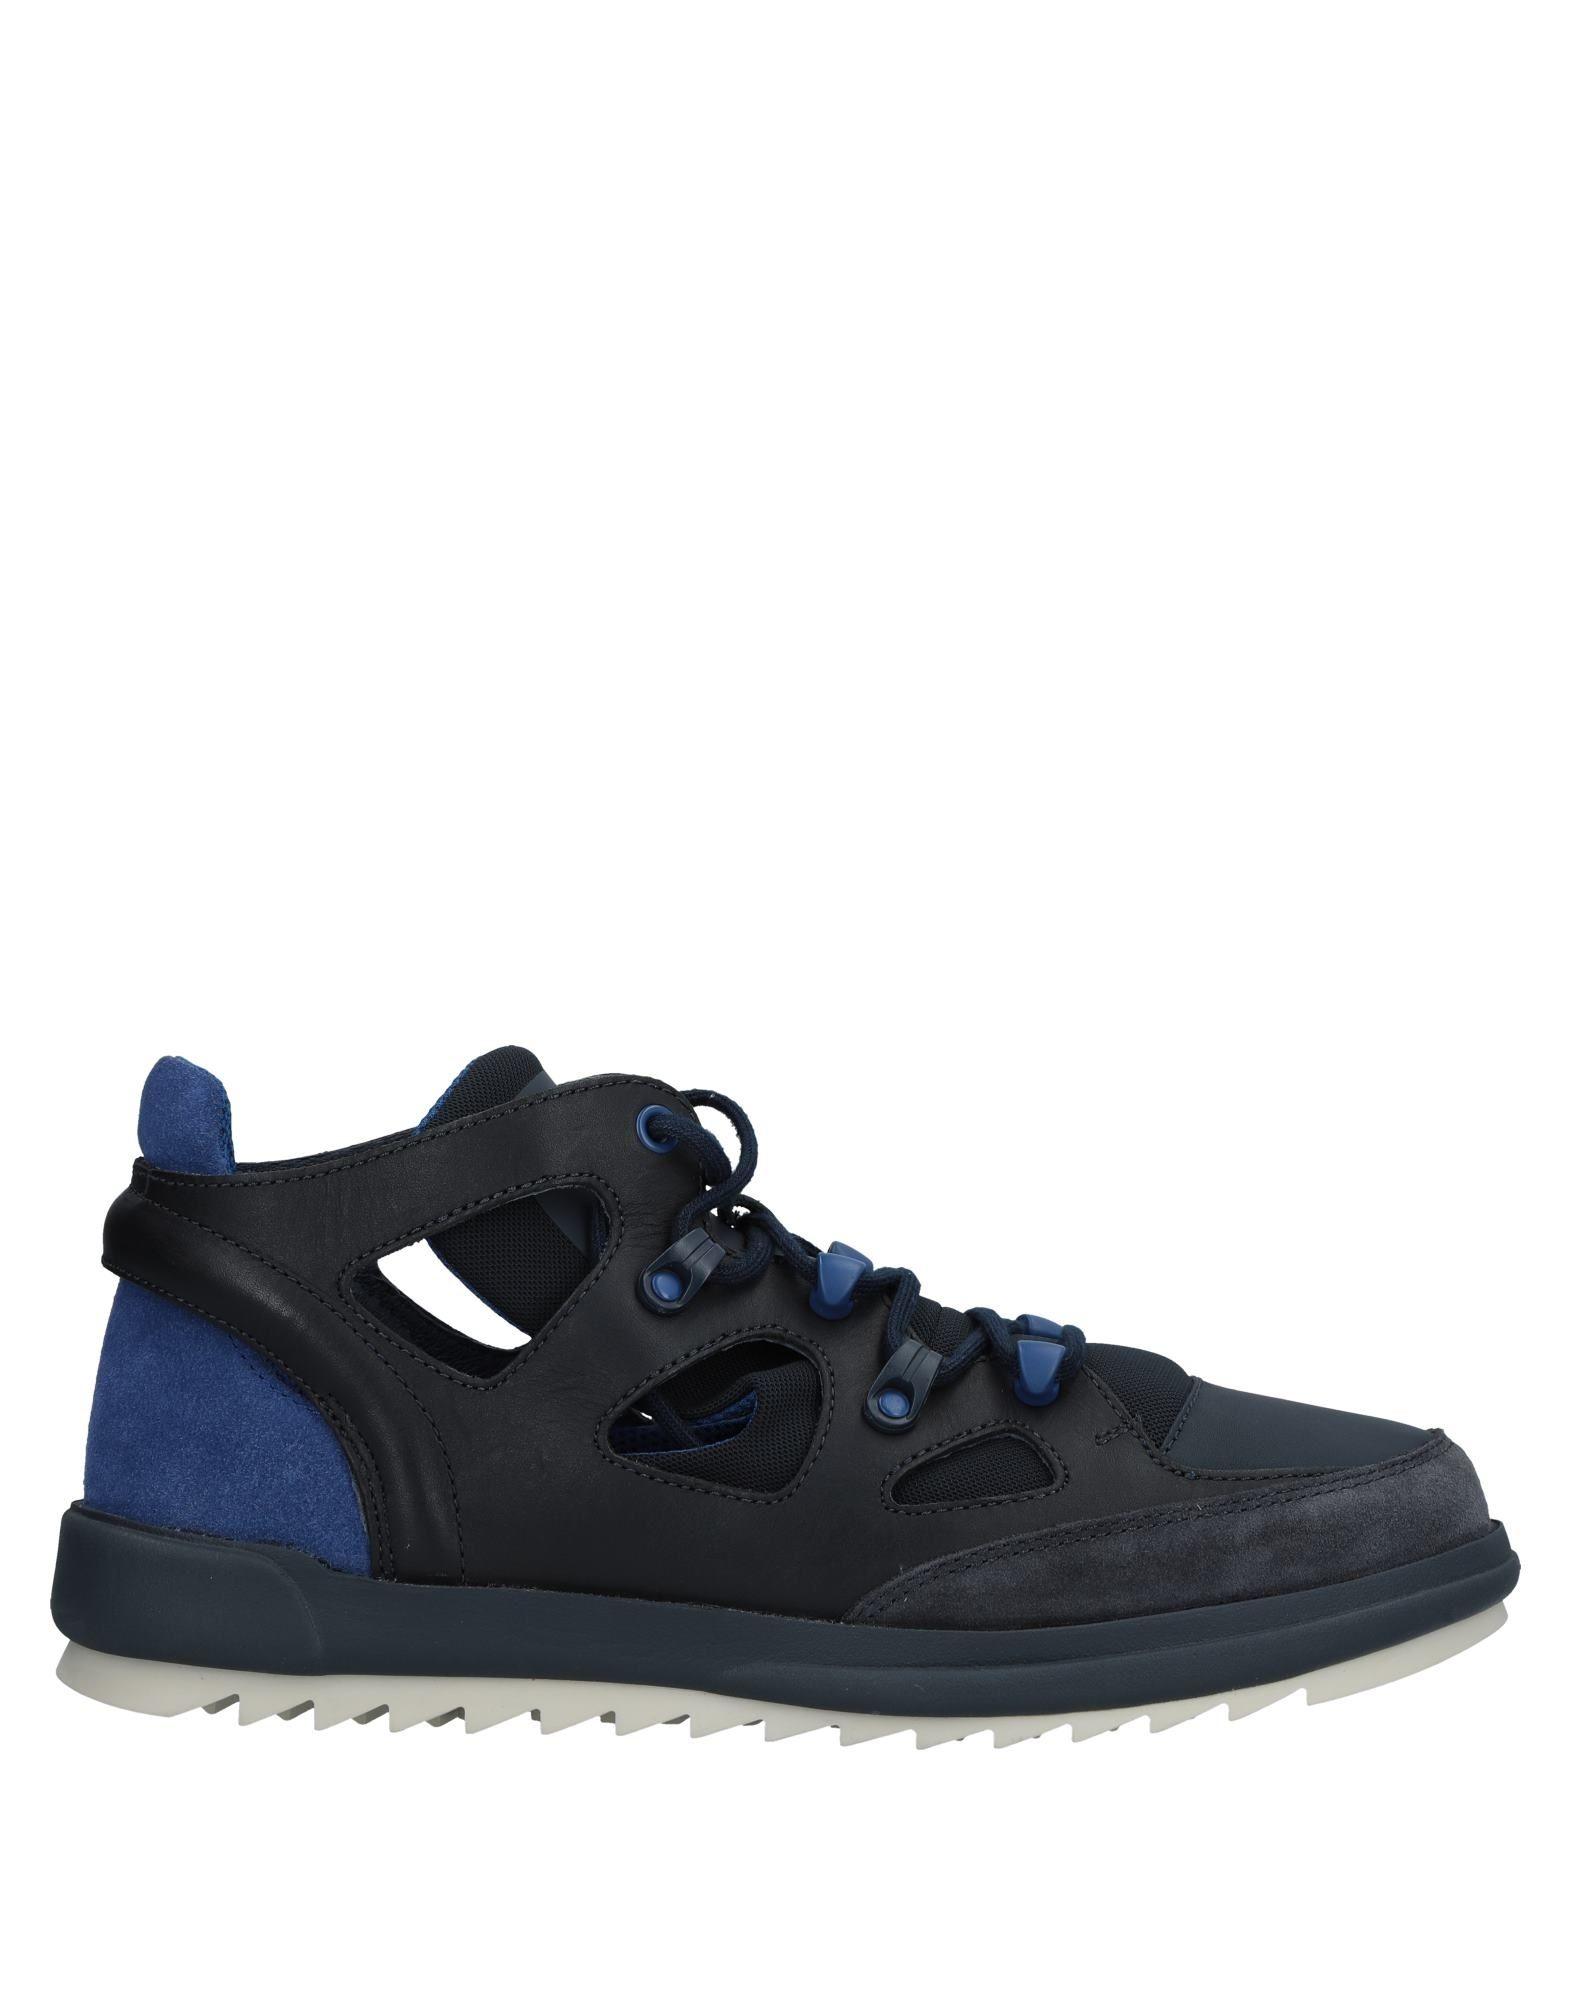 11523311BX Camper Sneakers Herren  11523311BX  Heiße Schuhe 7777e2